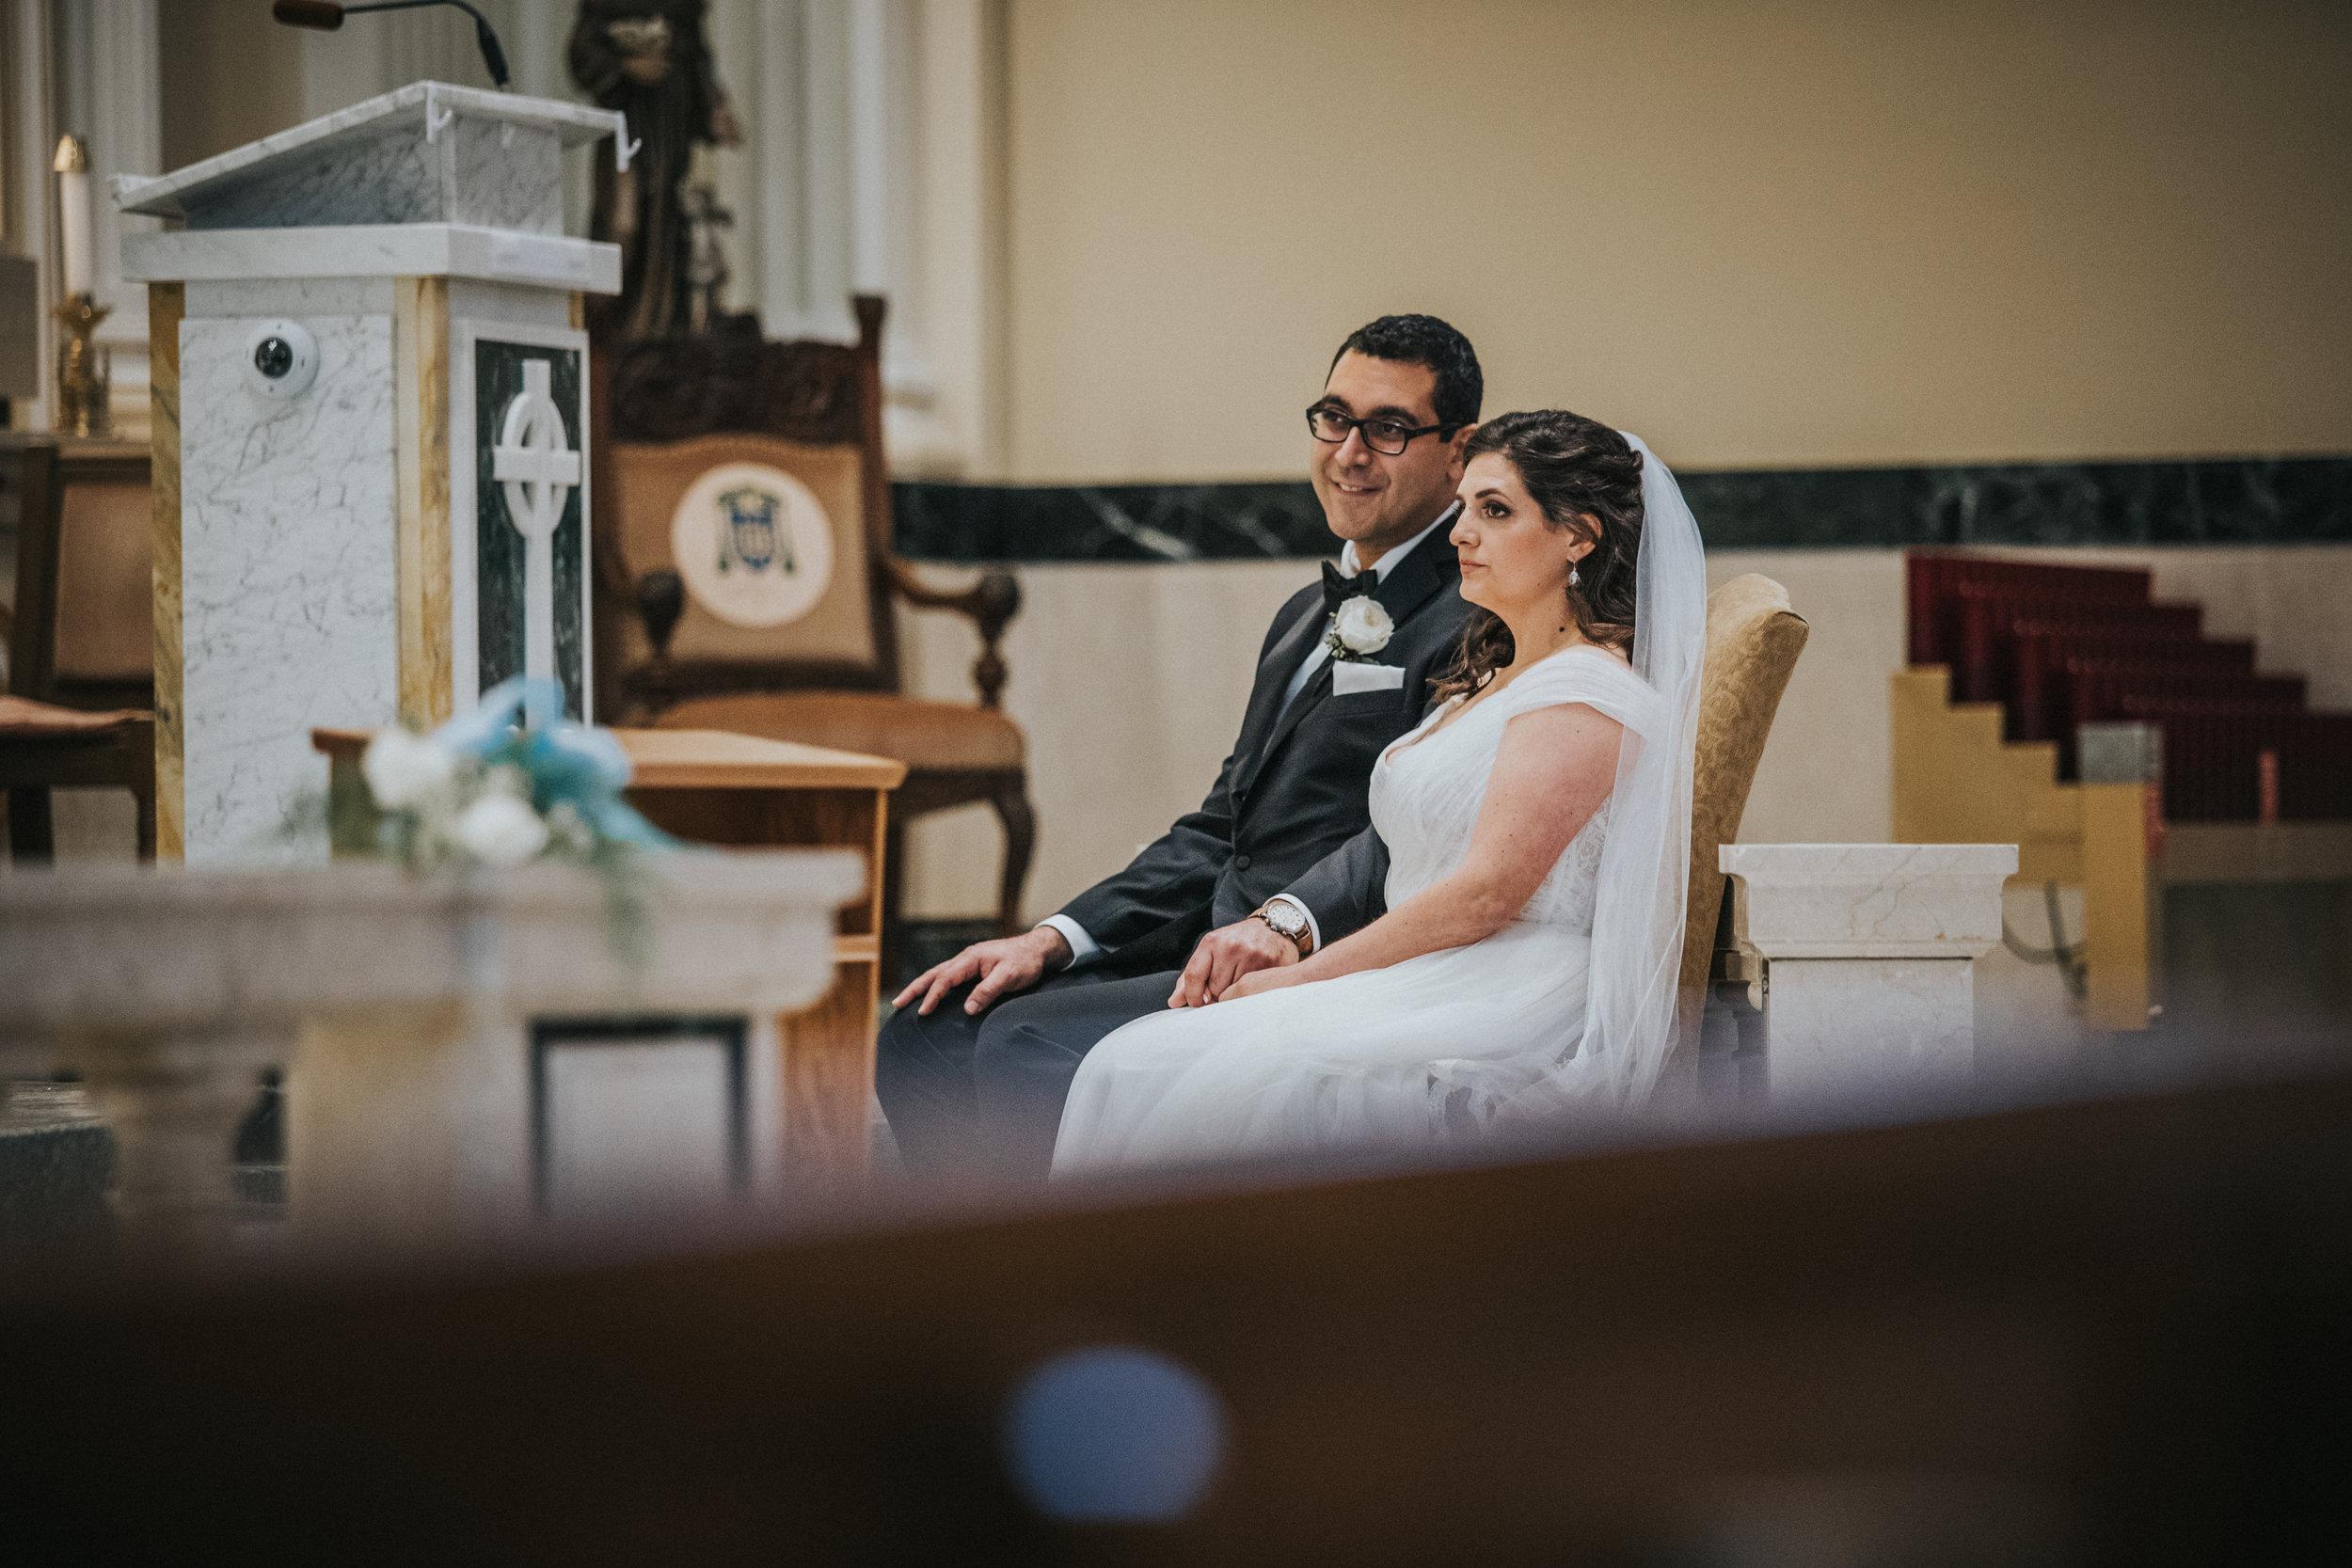 JennaLynnPhotography-NJWeddingPhotographer-Philadelphia-Wedding-ArtsBallroom-Ceremony-39.jpg